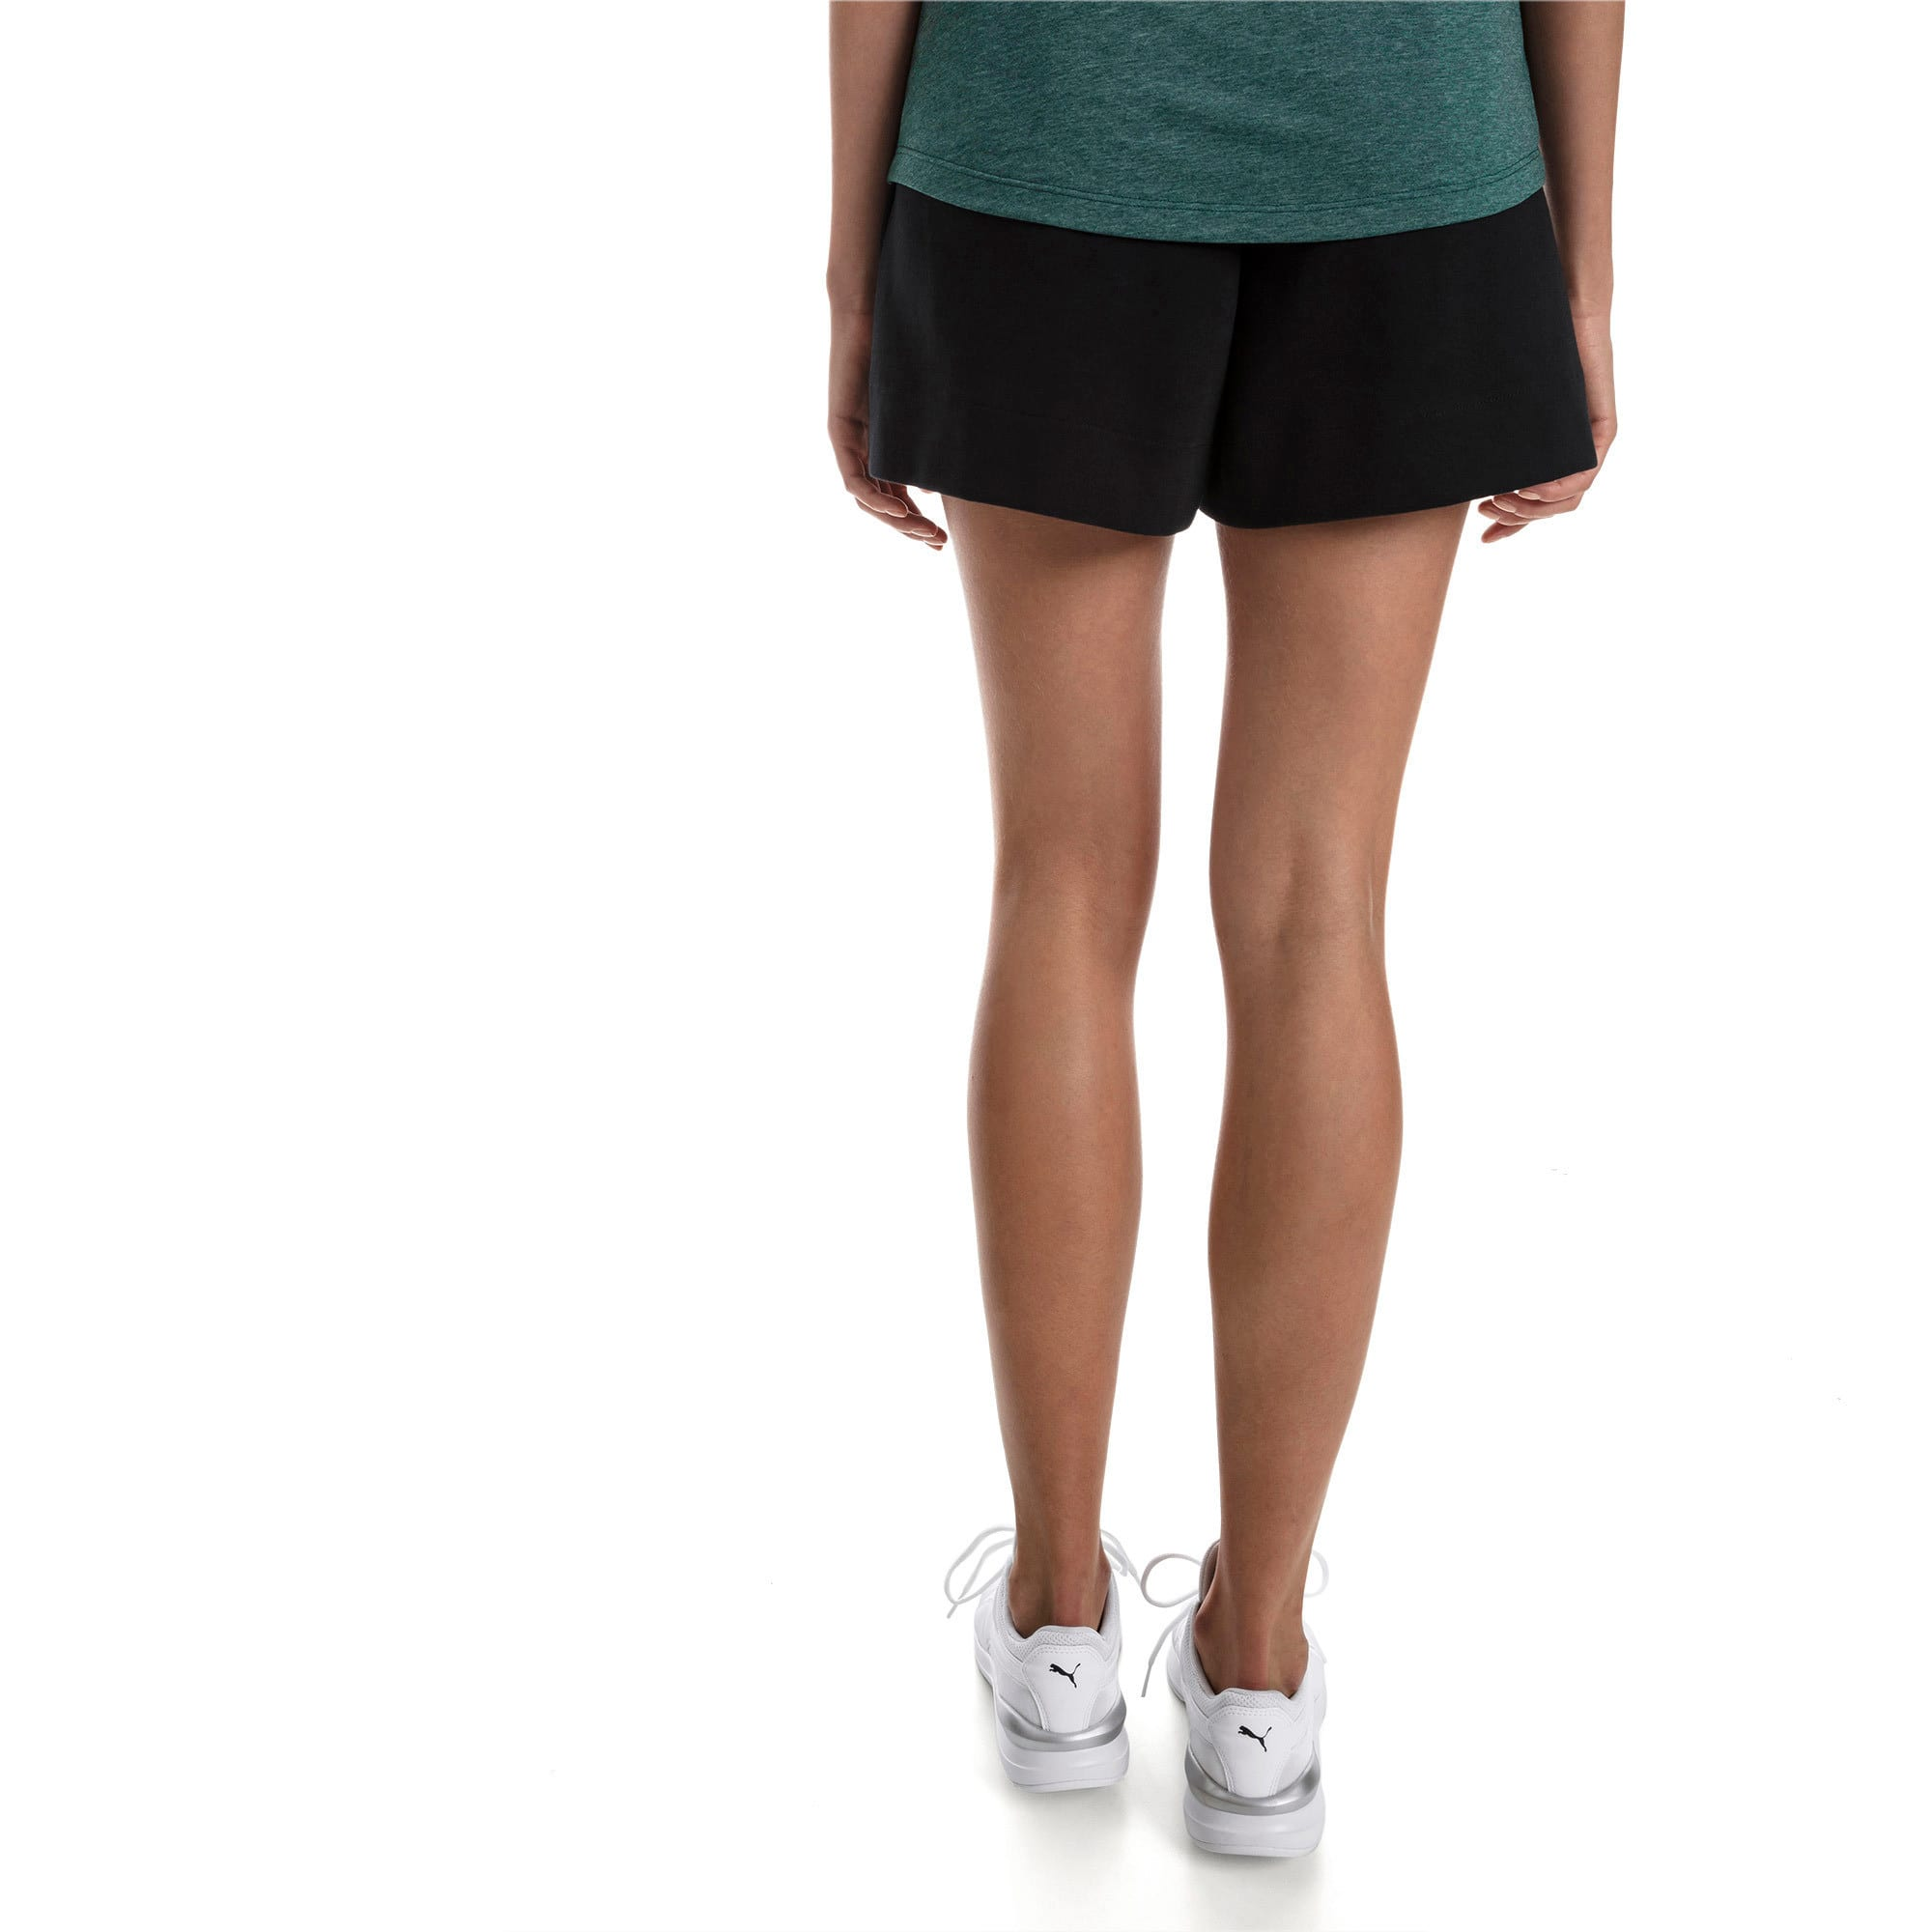 Thumbnail 2 of Evostripe Lite Women's Shorts, Cotton Black, medium